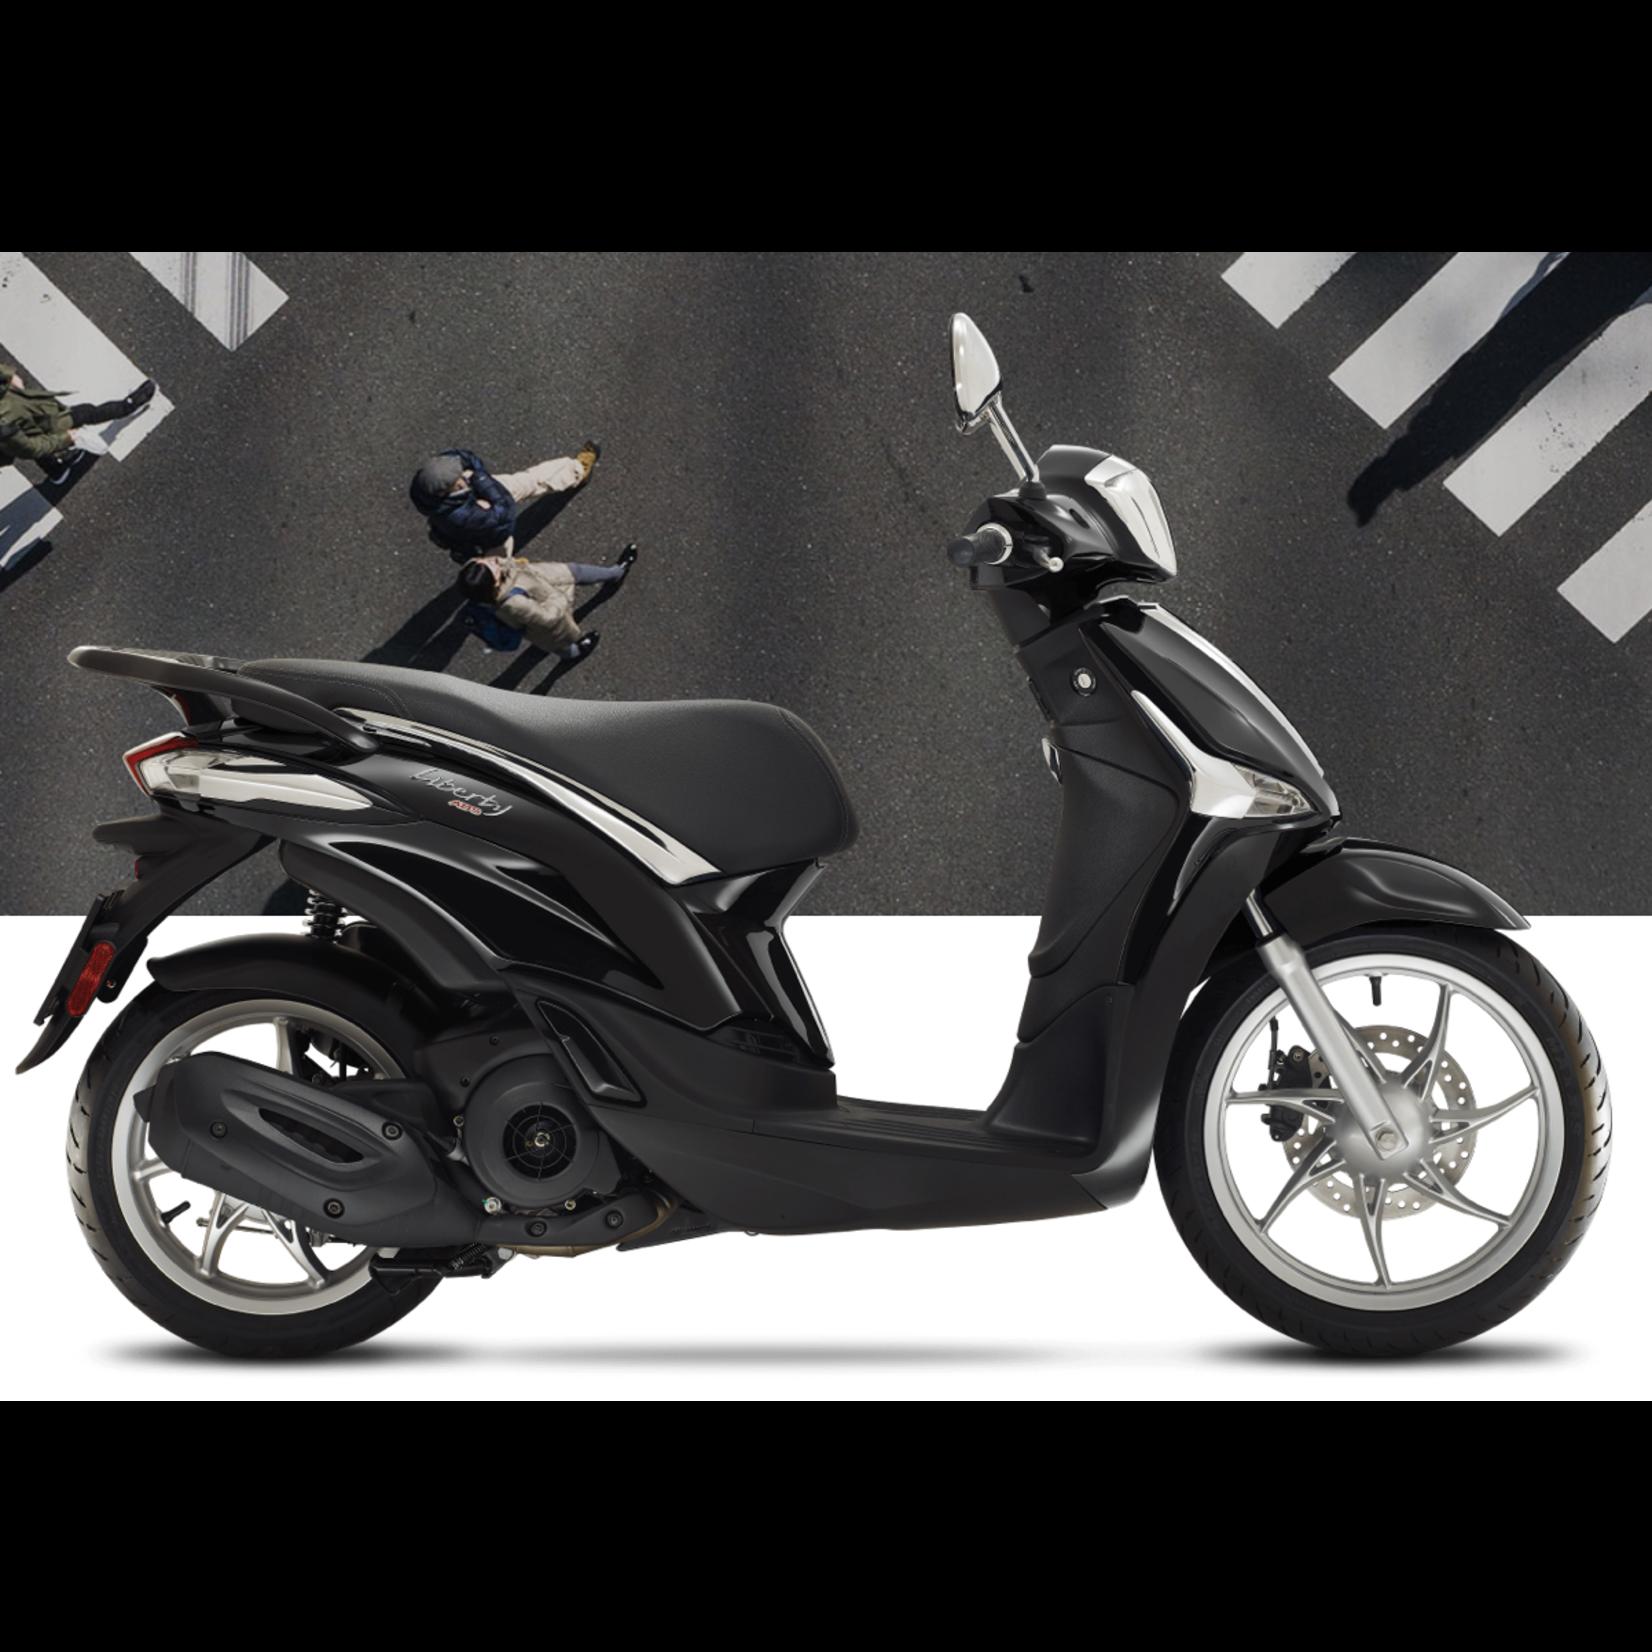 Vehicles Piaggio, 2021 Liberty iGET 50cc